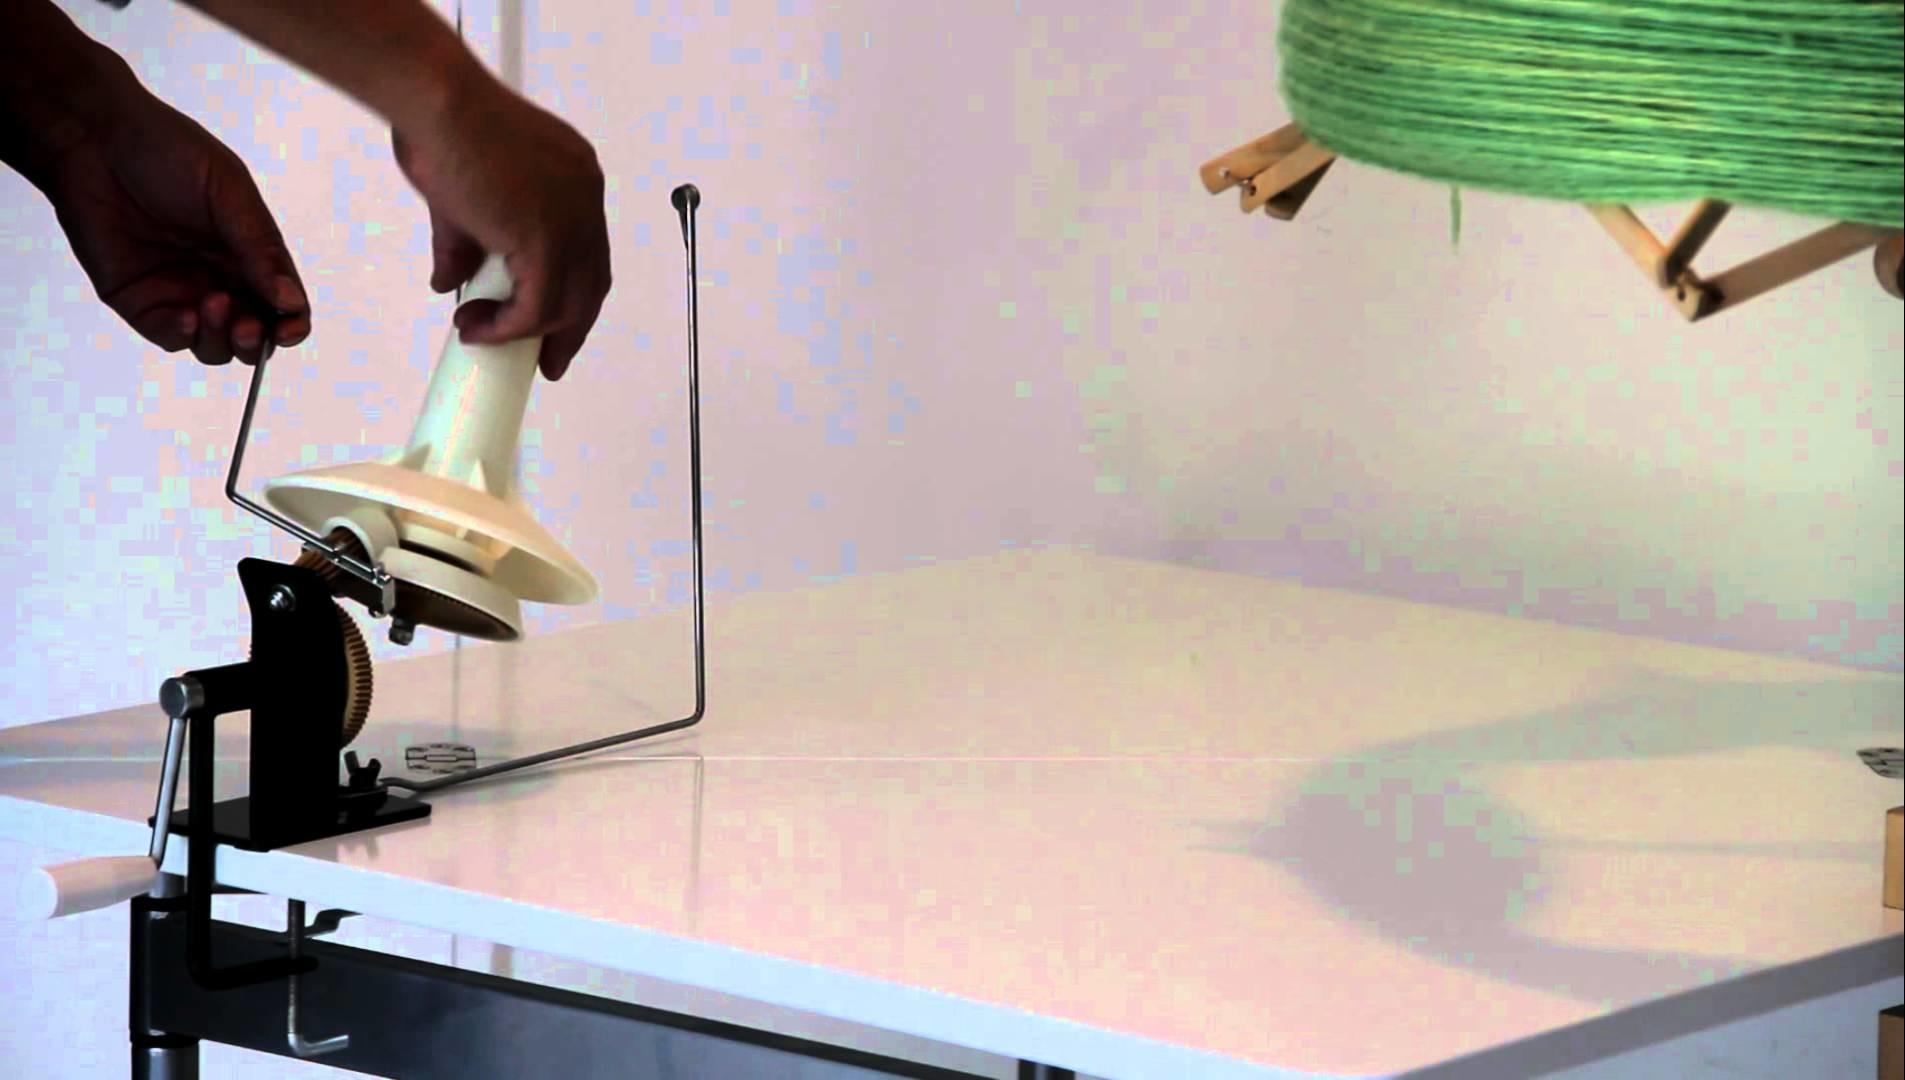 How to Use Jumbo Metal Ball Winder - 11 oz Capacity